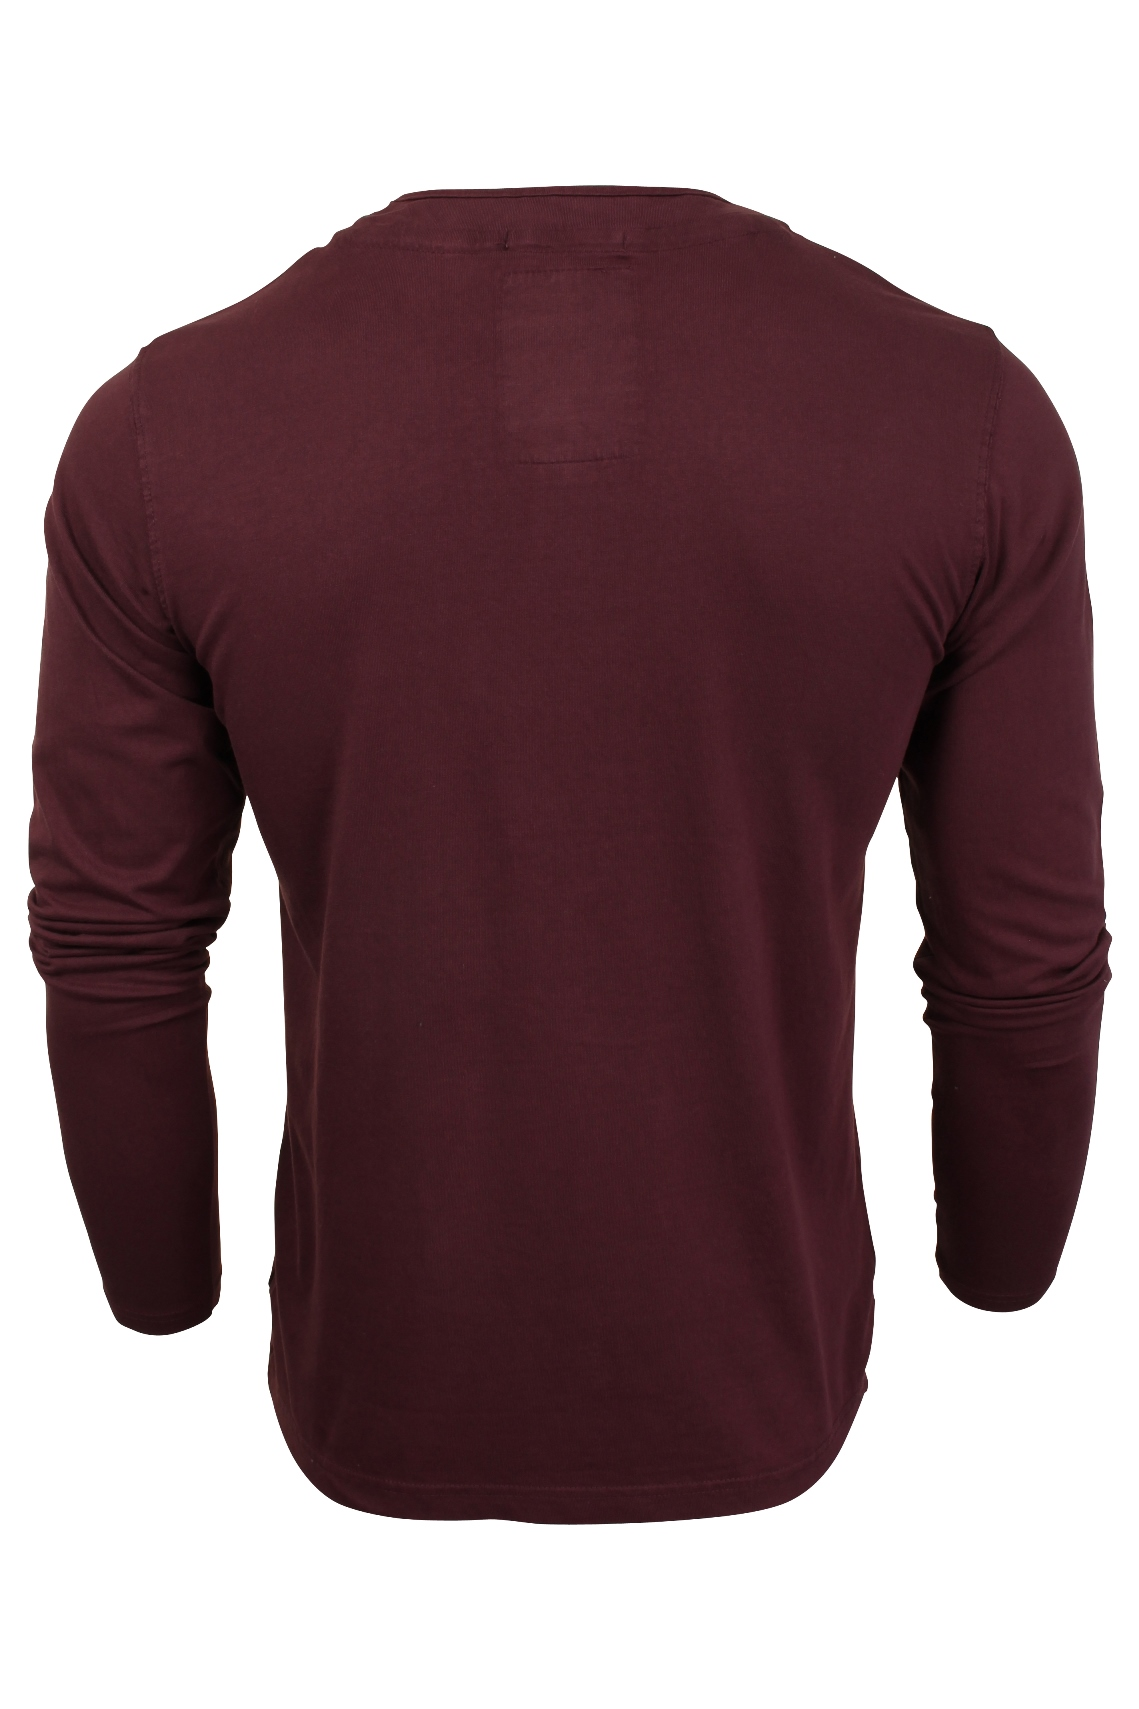 Mens-Grandad-T-Shirt-by-Tokyo-Laundry-039-Winter-Pines-039-Long-Sleeved thumbnail 11